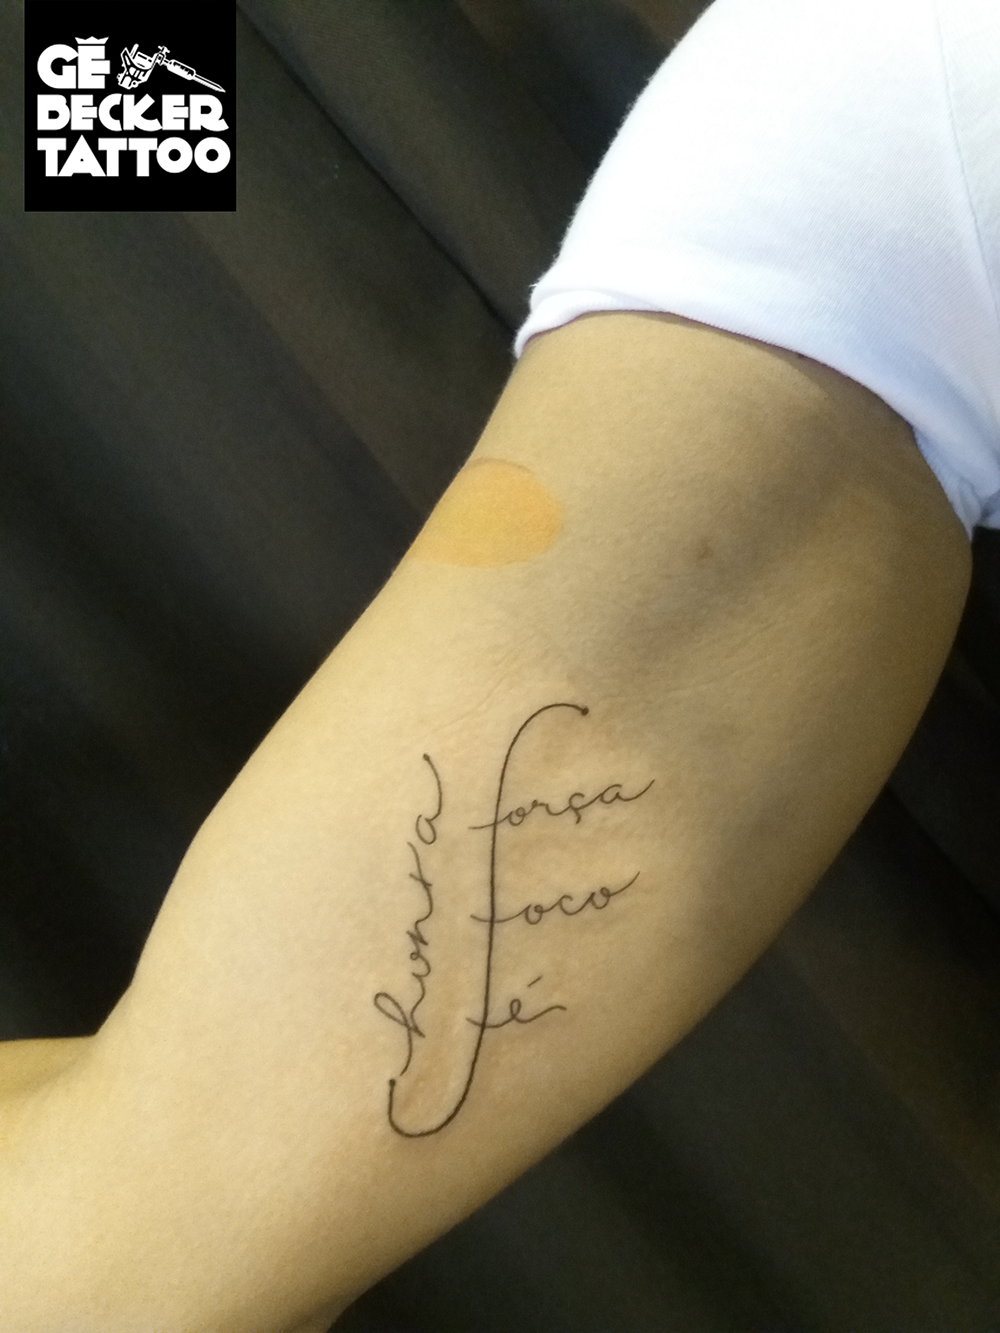 Tattoo Lettering Honra Foco Força Fé Letras Escrita